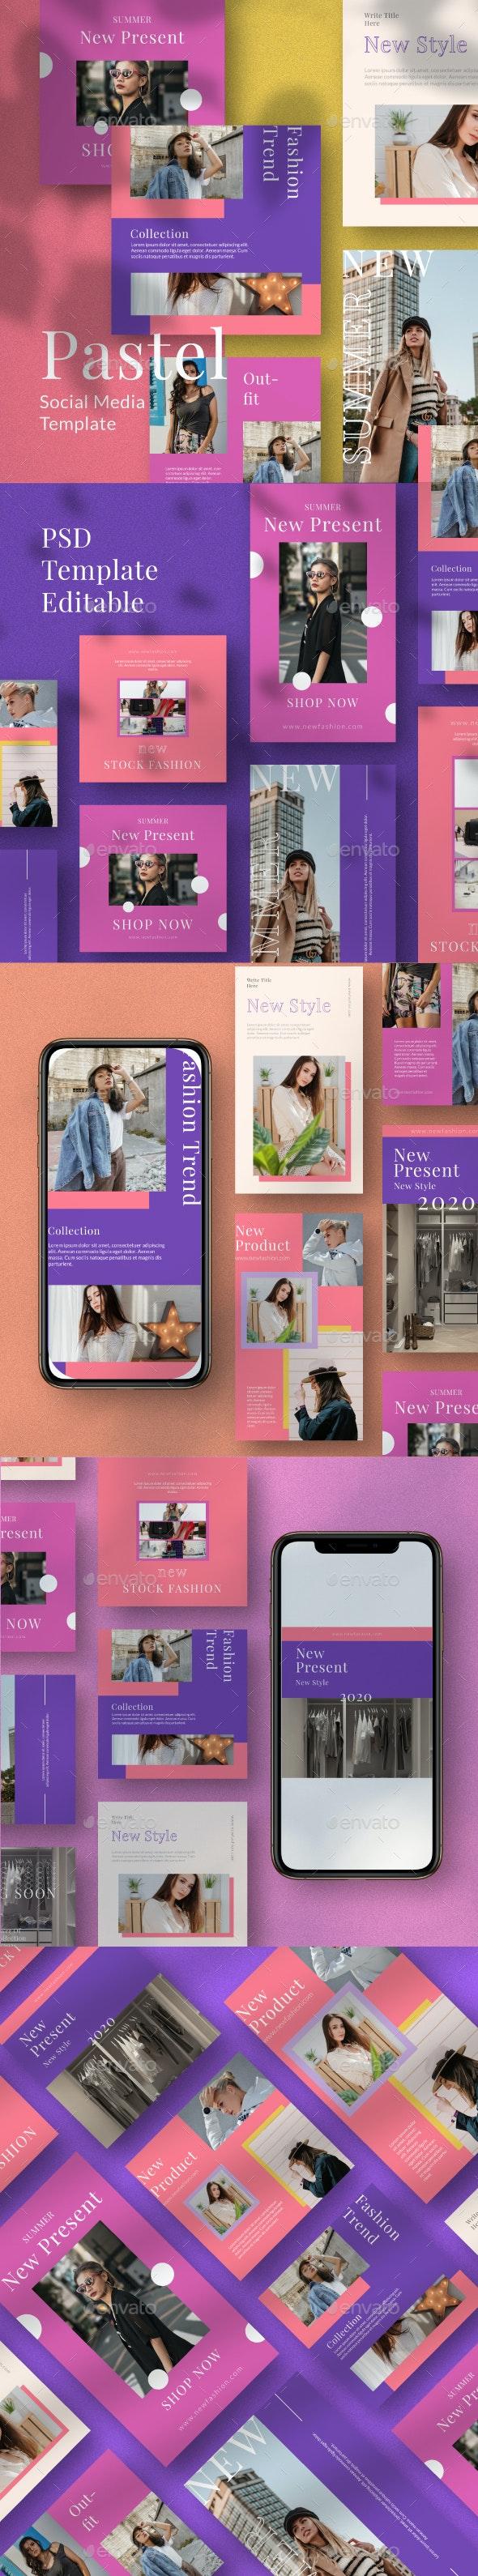 Pastel Instagram Template - Social Media Web Elements